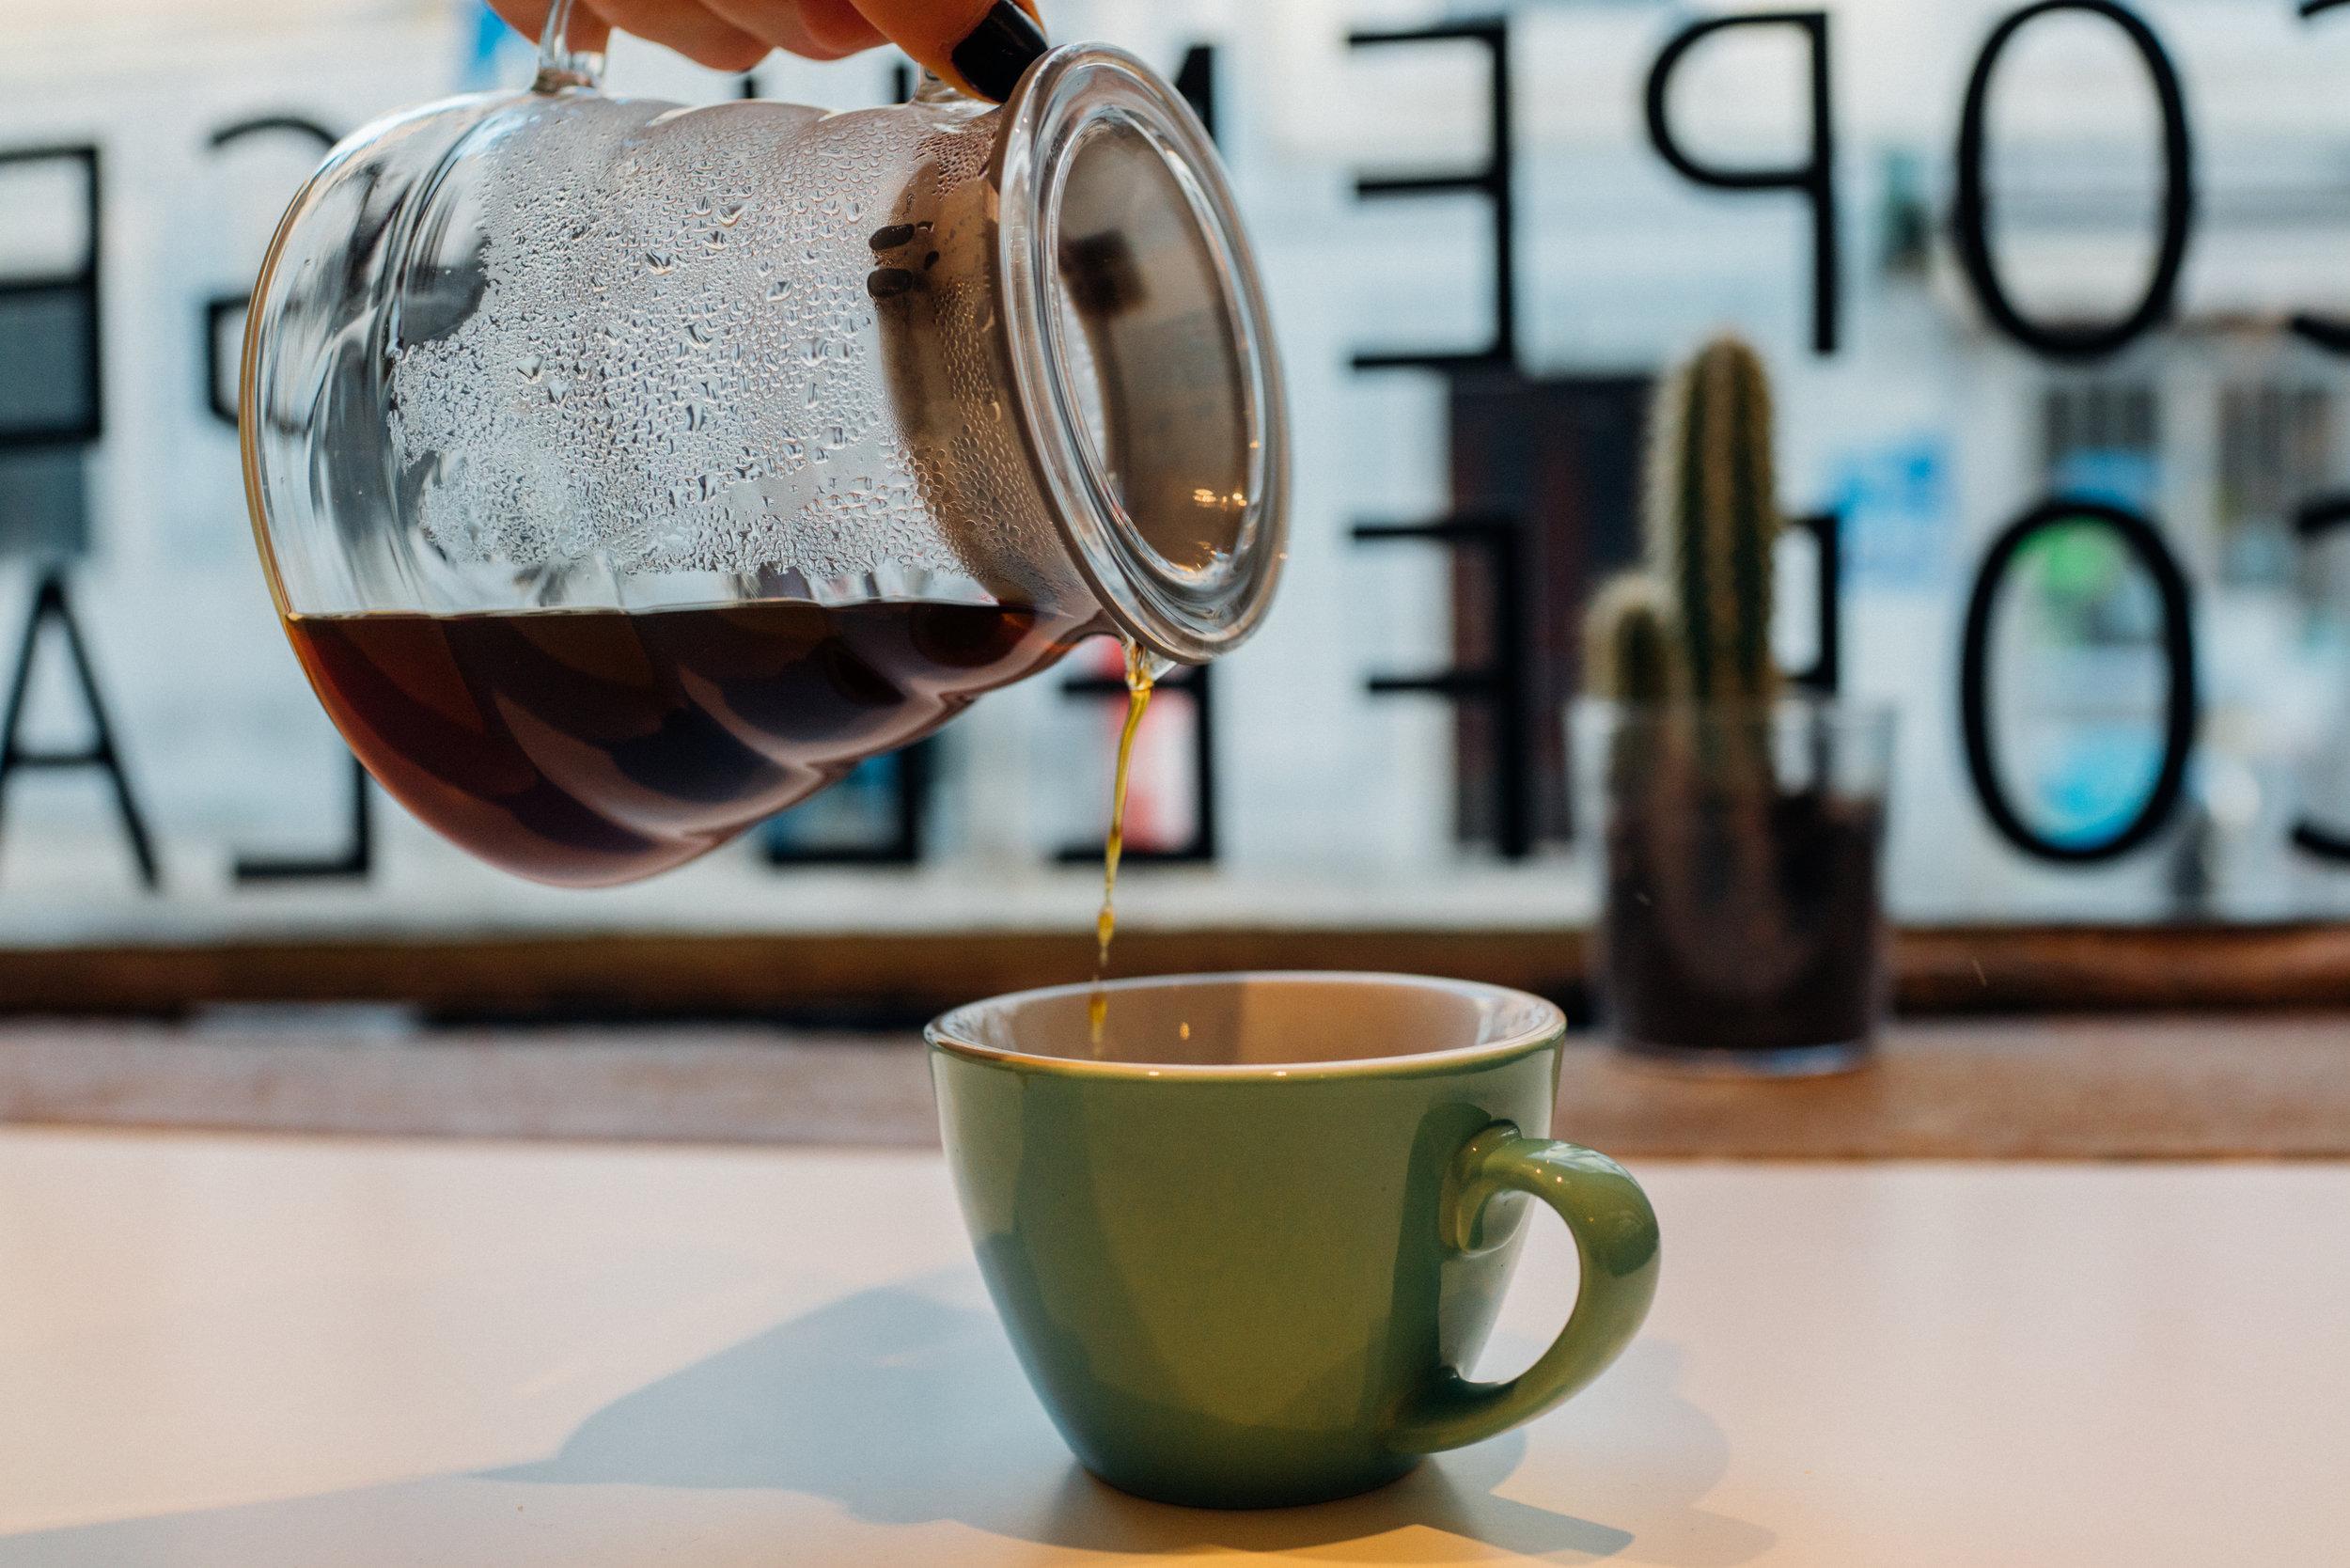 A pourover at Copenhagen Coffee Lab